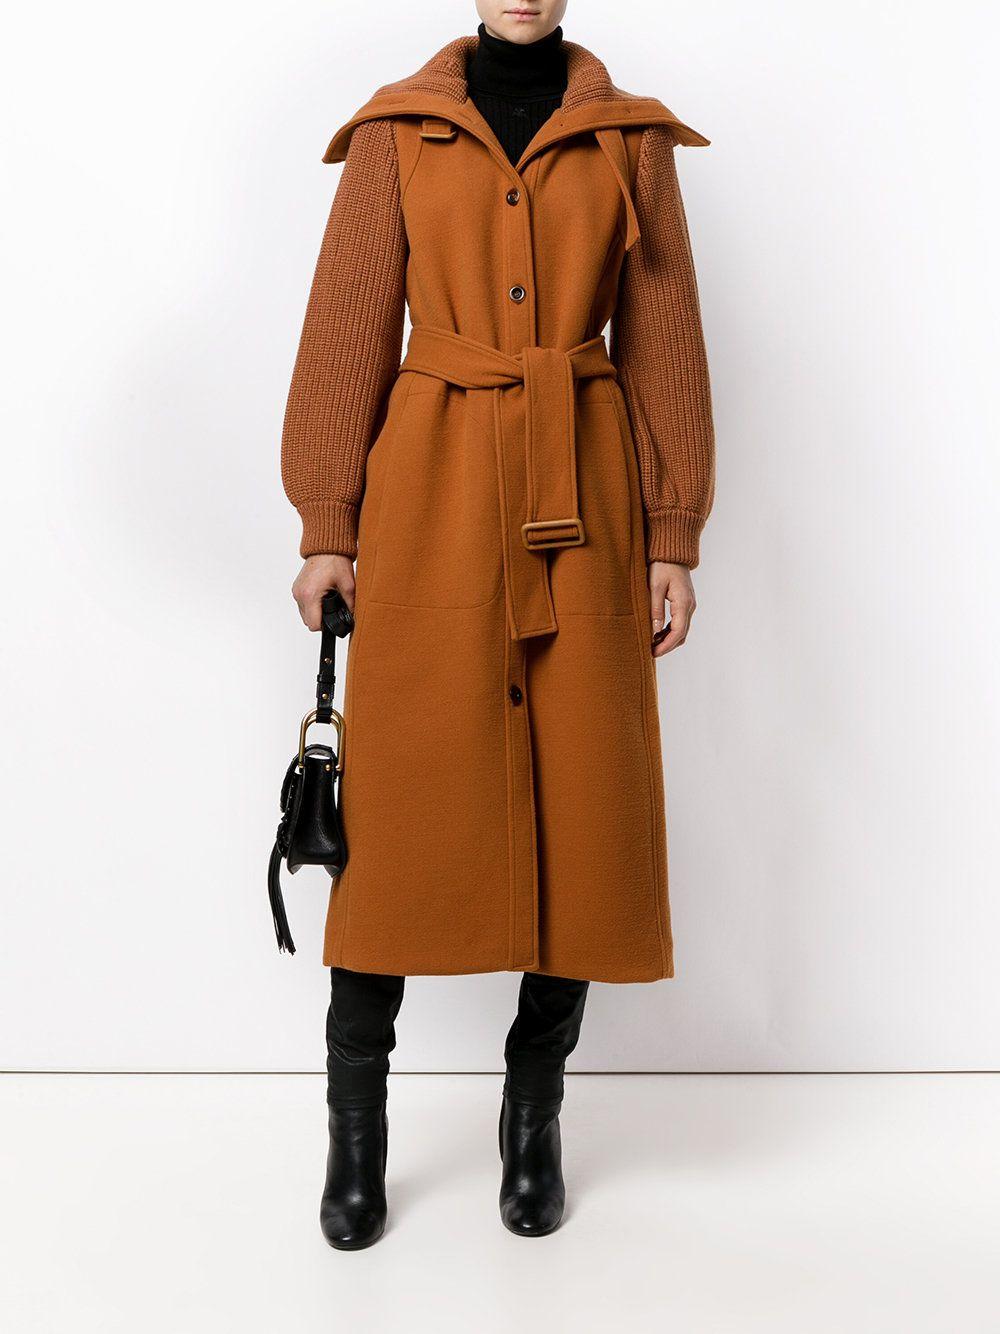 Chloé пальто с высоким воротом, Chloé coat, пальто ...